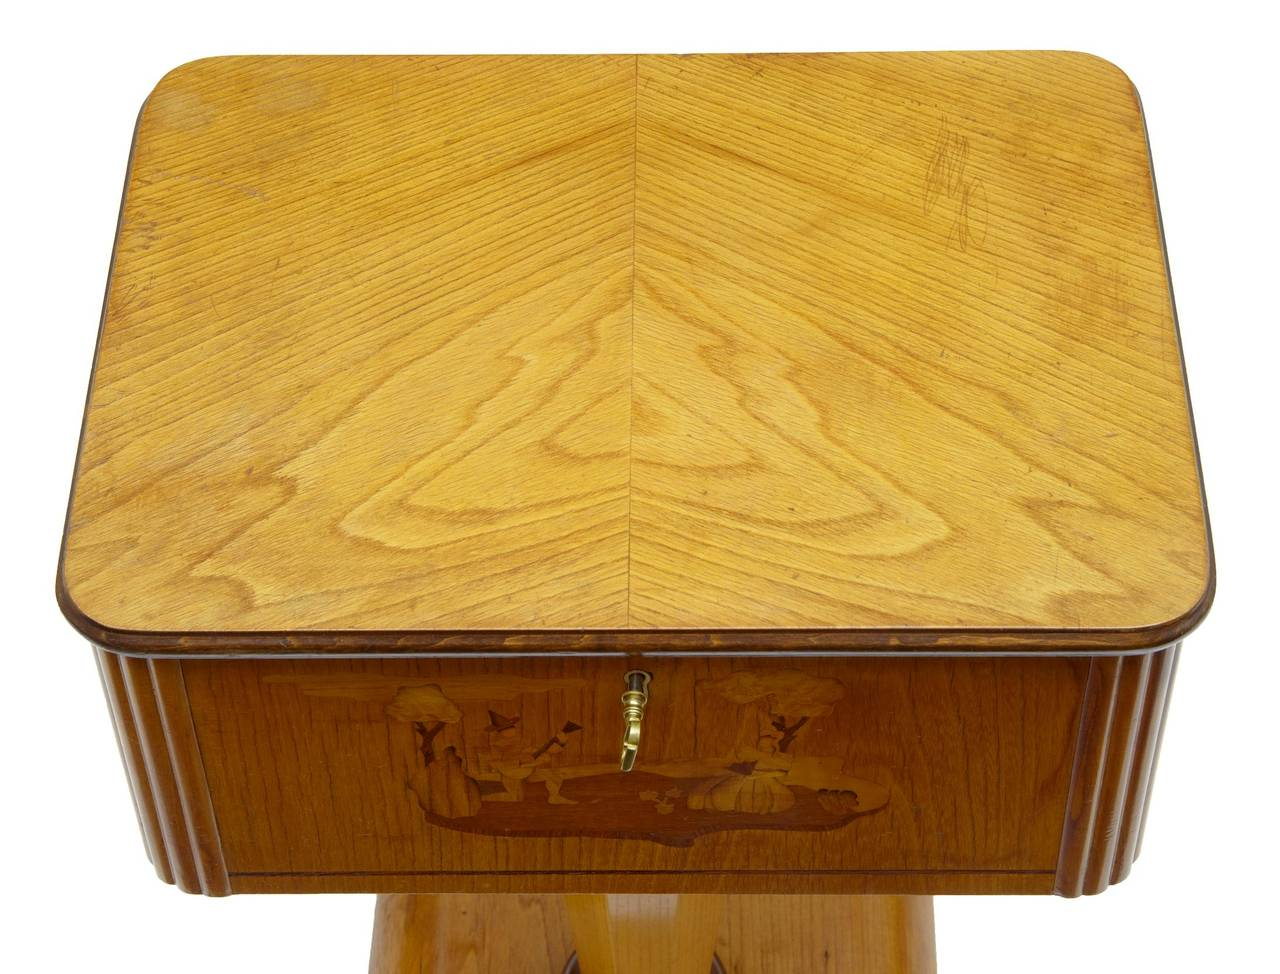 1920s Art Deco Birch Inlaid Small Work Table In Good Condition For Sale In Debenham, Suffolk